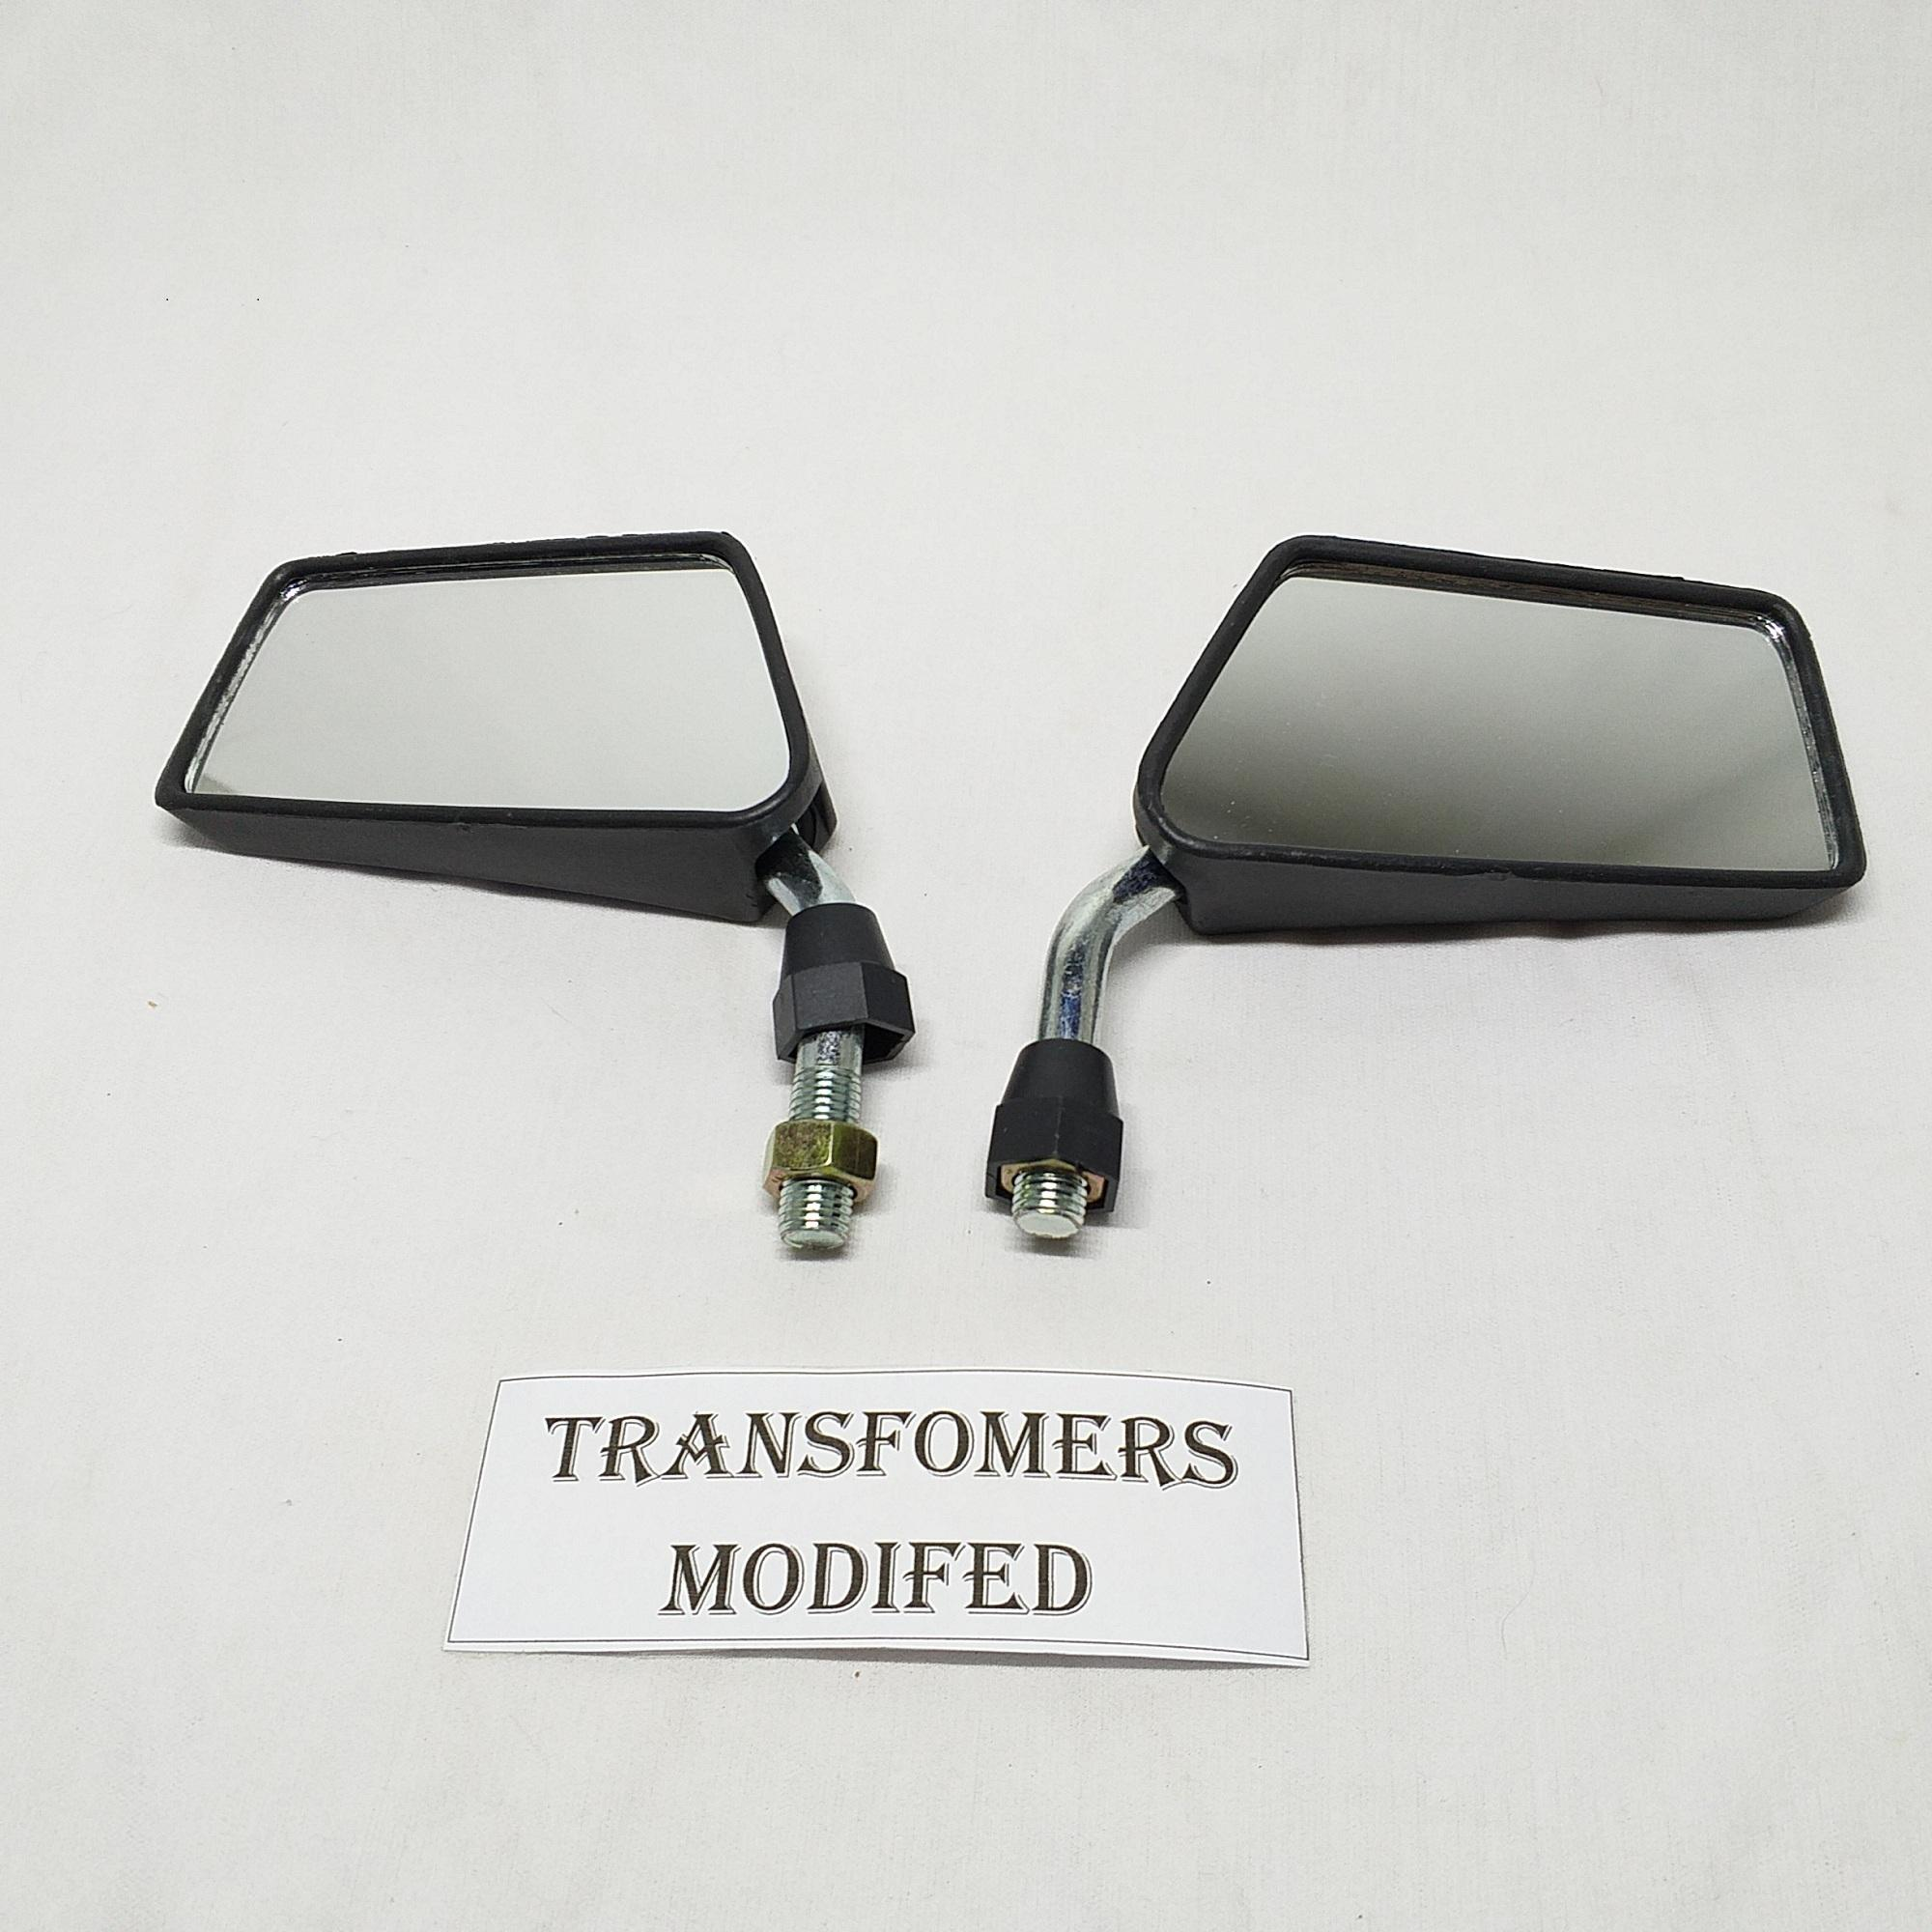 Spion Kotak Yamaha Rx King New By Transformer Modifed.